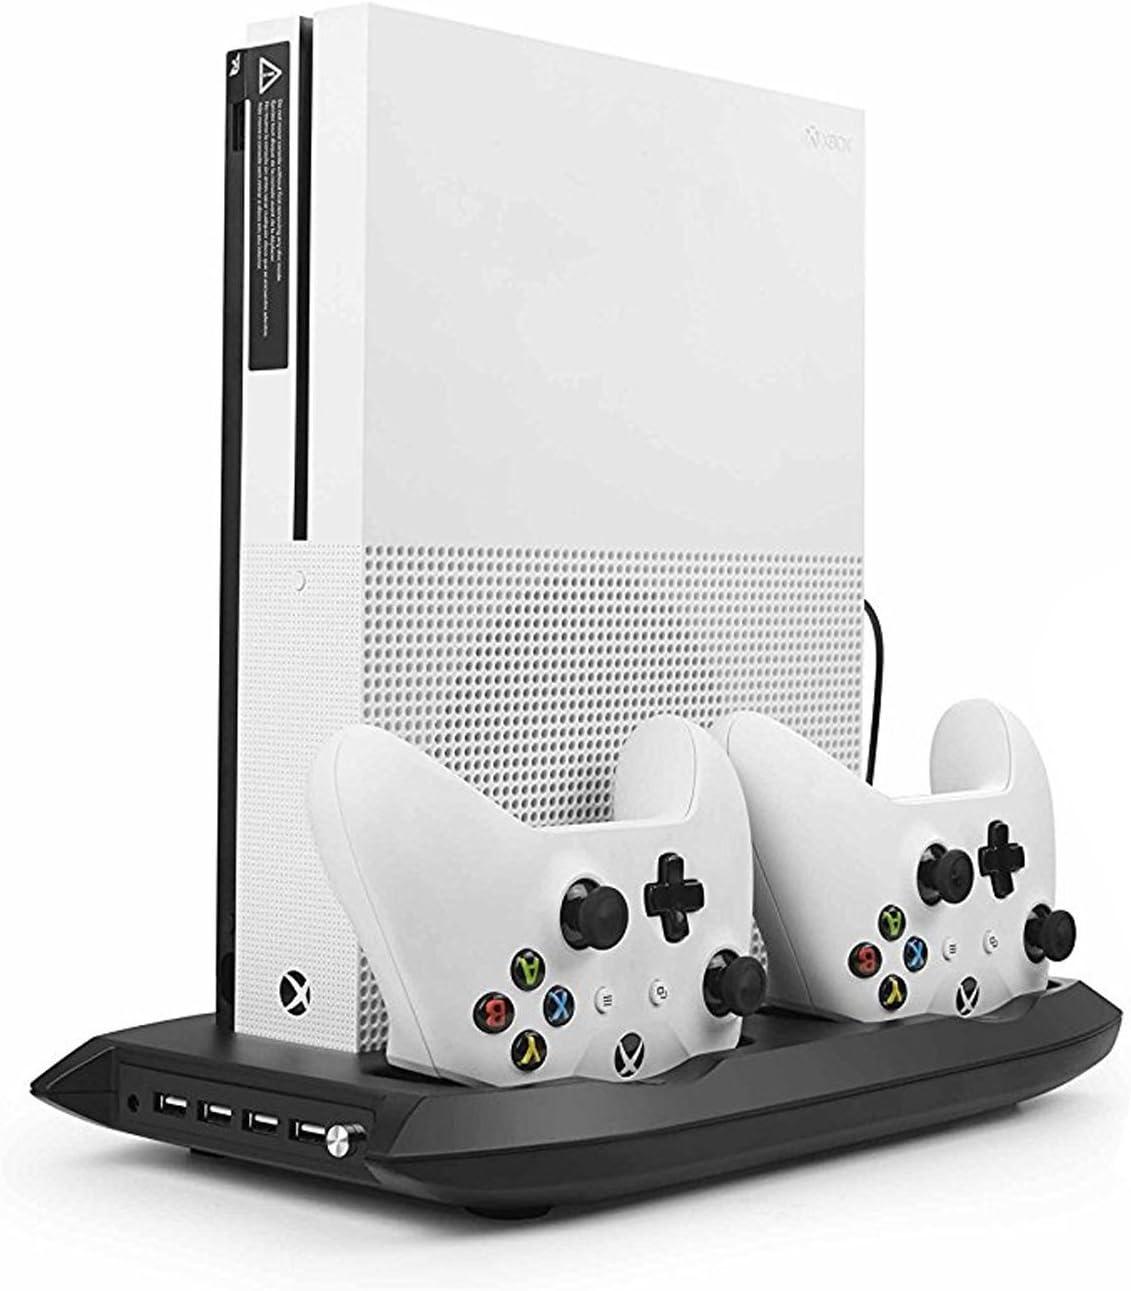 Xbox One S Soporte Vertical con Ventilador de Enfriamiento, Estación de Carga para Mando Xbox One con 4 Hub USB para Microsoft Xbox One Slim Consola: Amazon.es: Electrónica